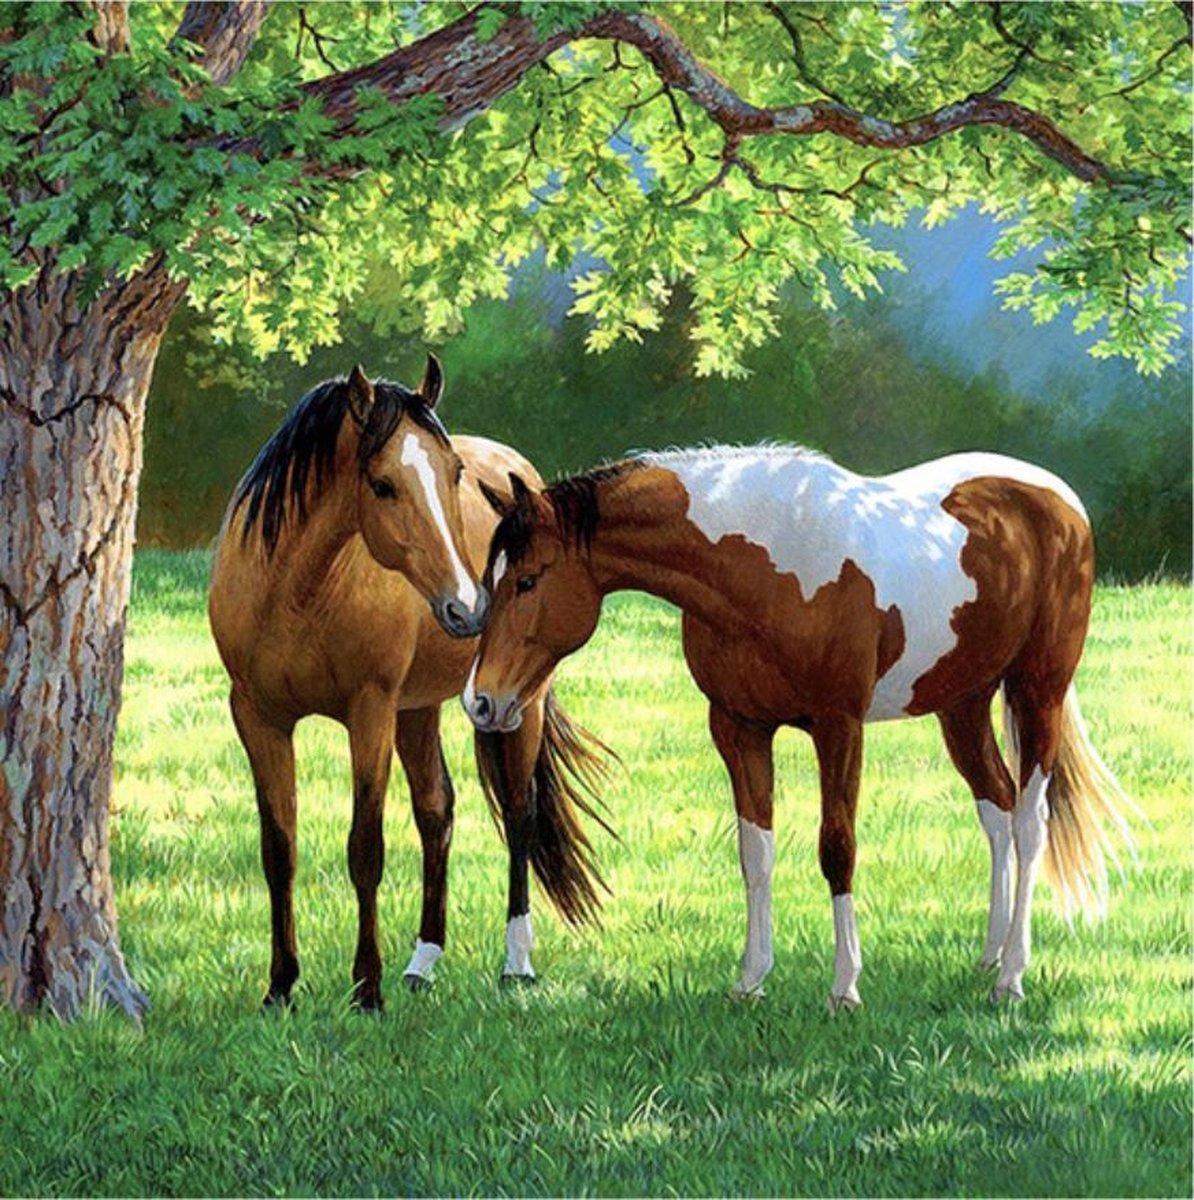 Diamond Painting Pakket Prachtige Paarden Staan Onder een Boom - Volledig - Diamond Paintings - 30x30 cm - Vierkant - Dotz - SEOS Shop ®